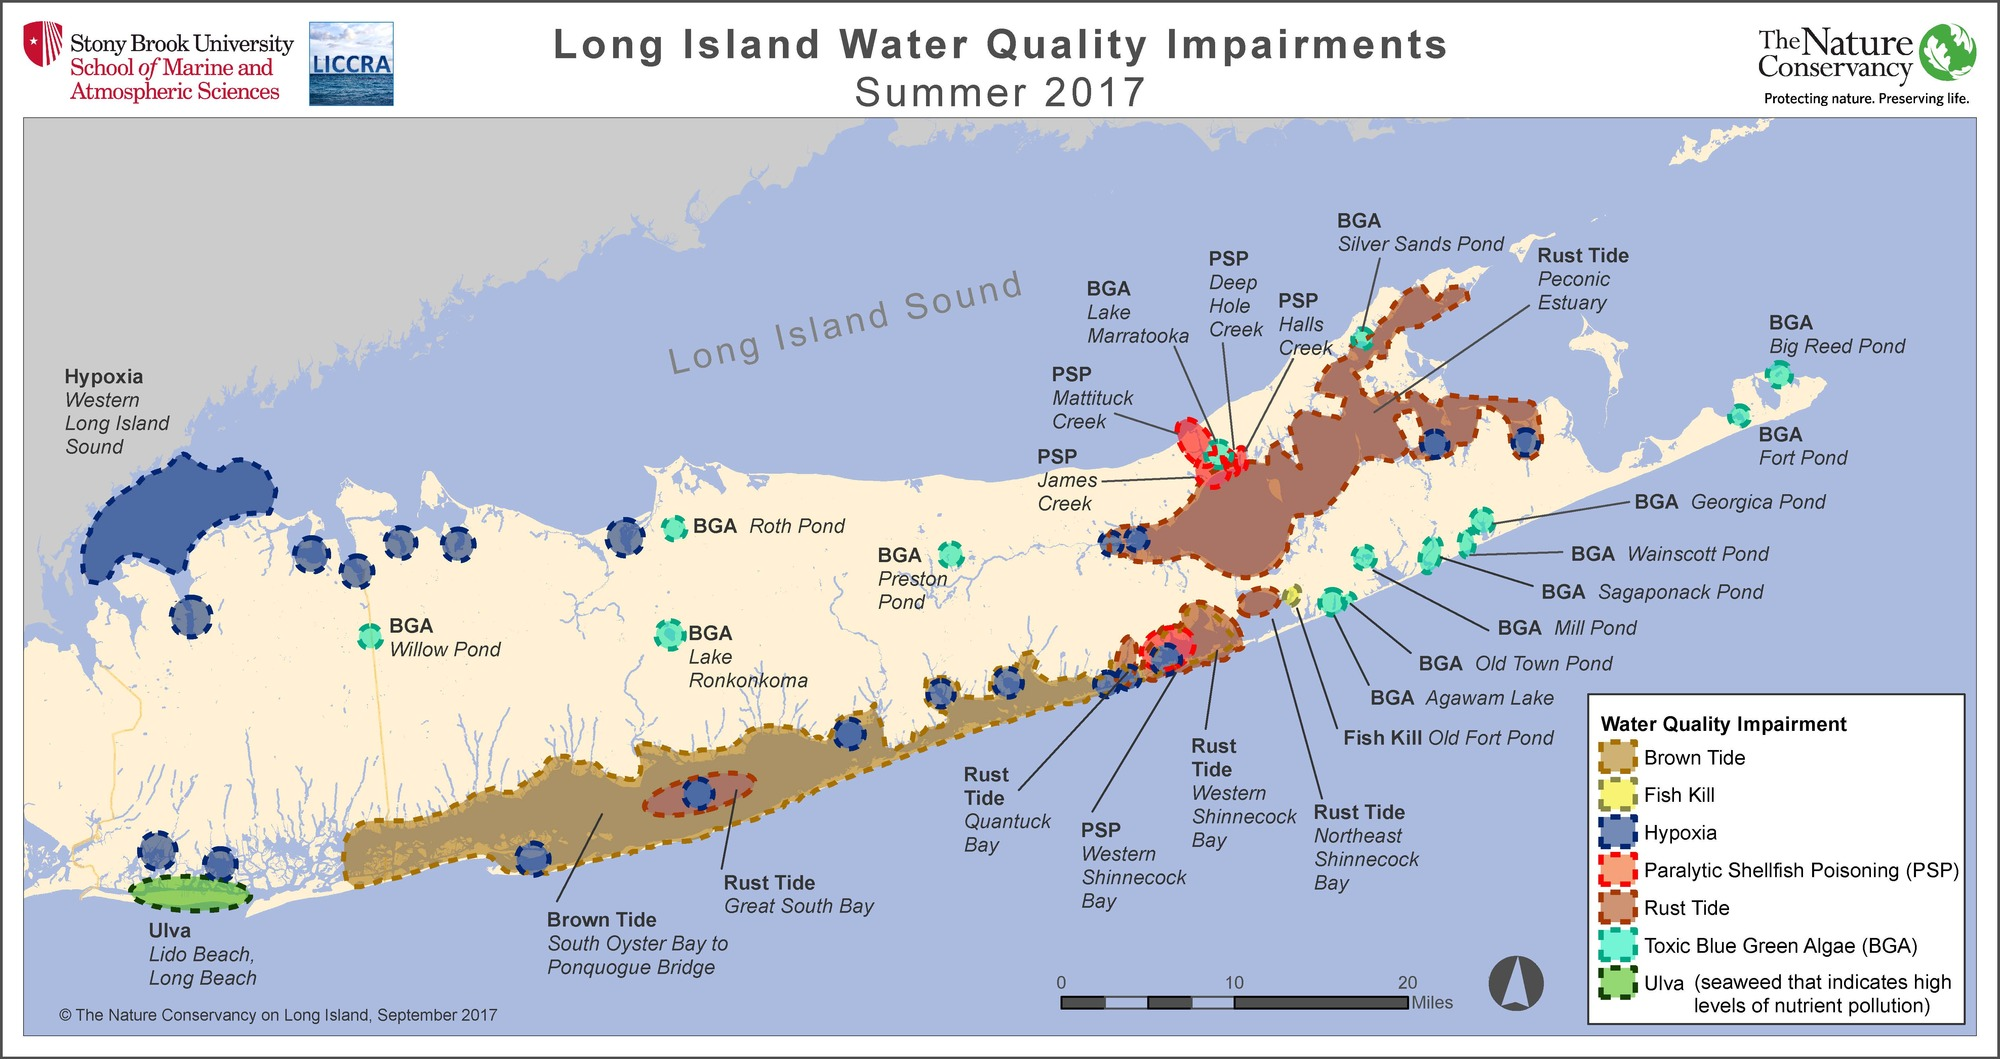 LI Water Quality Impairments 2017